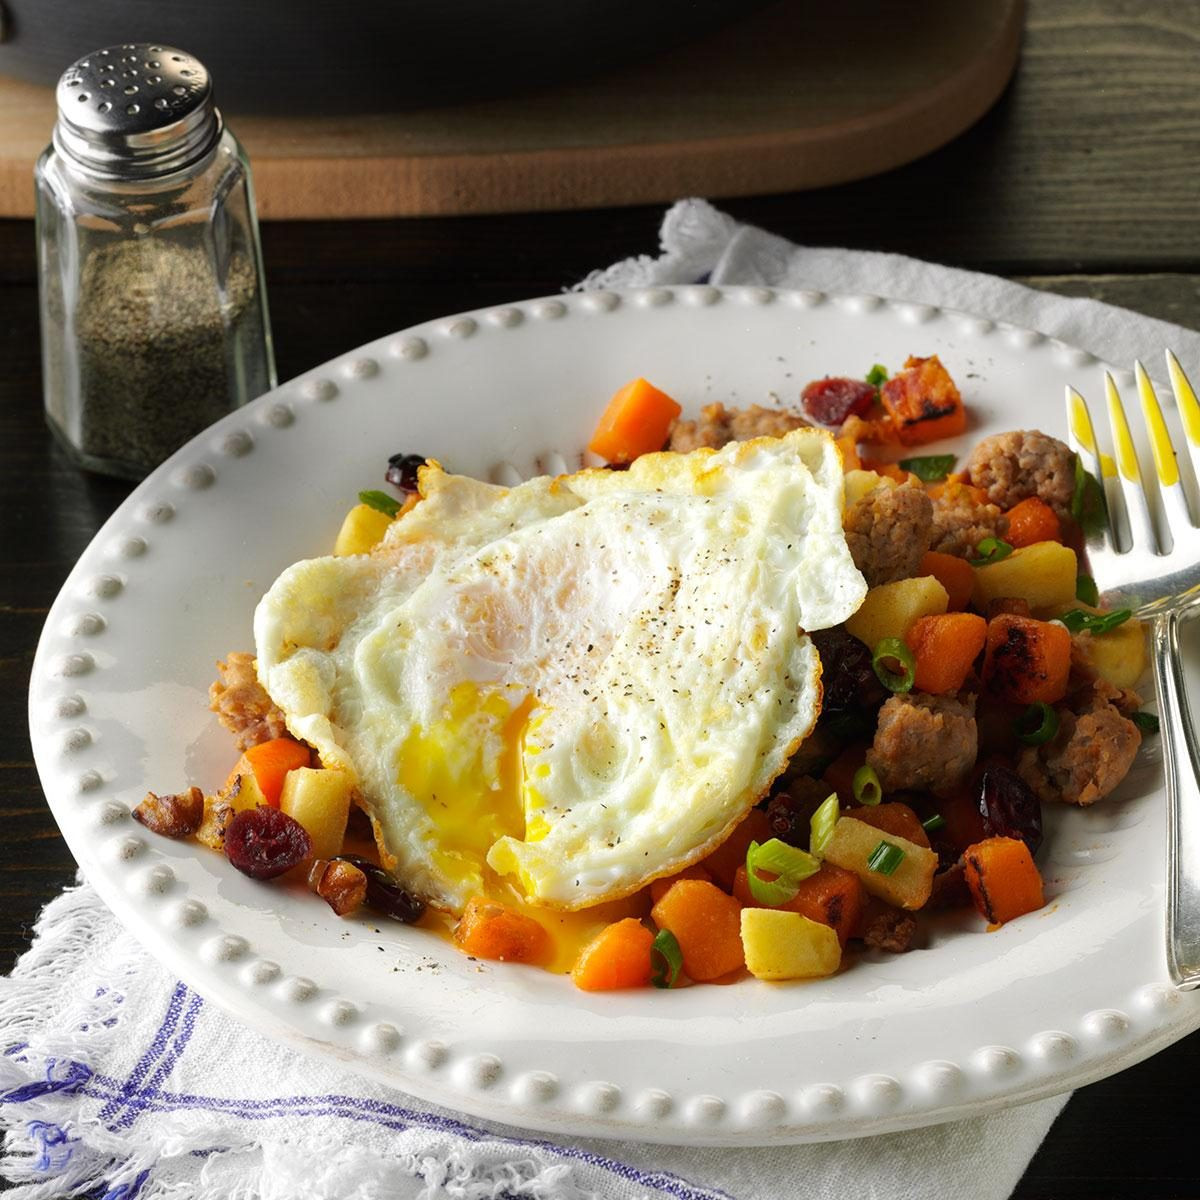 Diabetic Brunch Recipes  40 Delicious Brunch Recipes for Diabetics